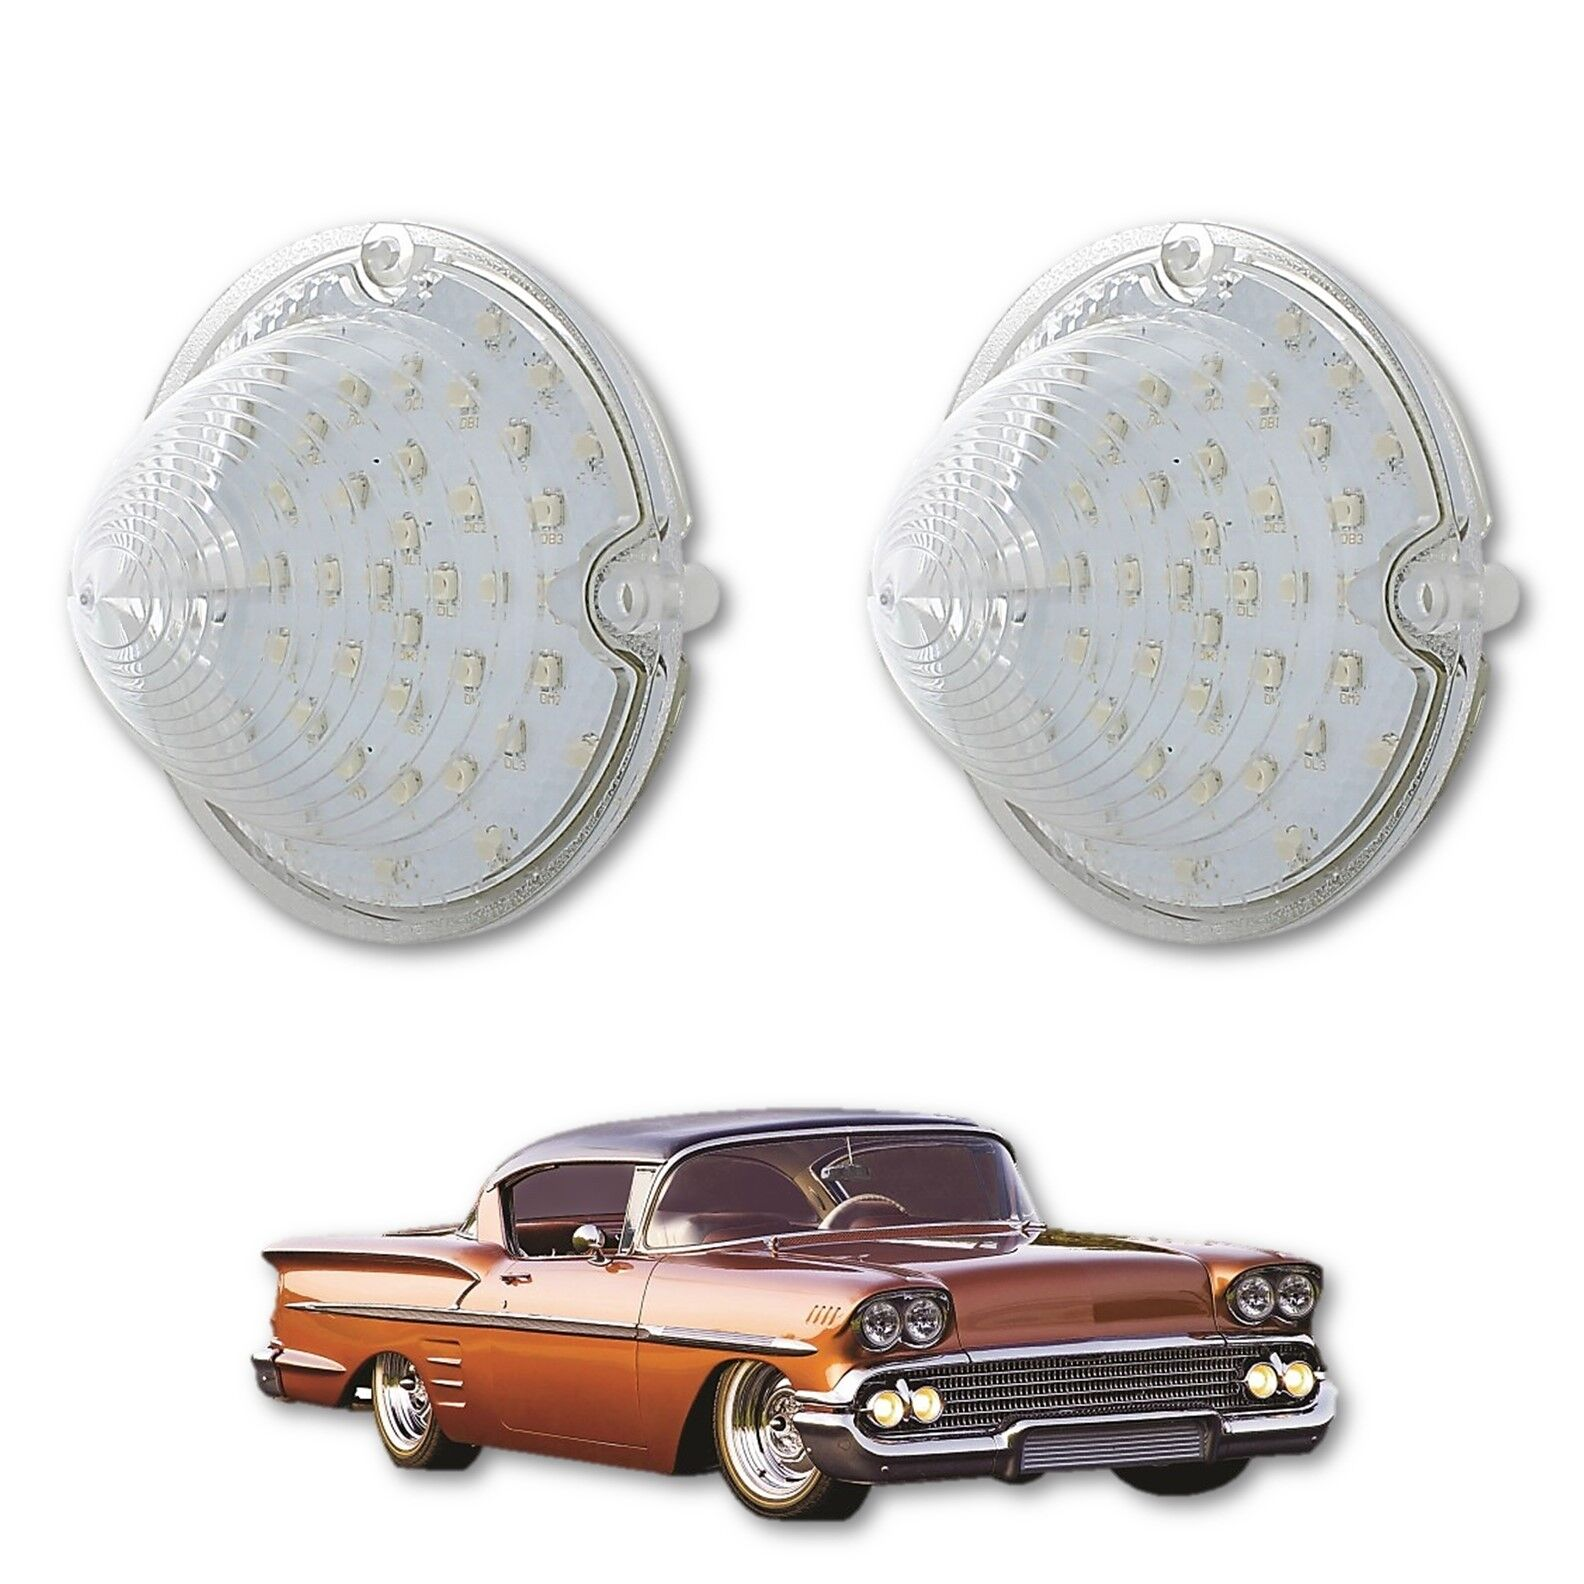 1958 Bel Air Or Biscayne Taillight And Back Up Light Lens And Gasket Set